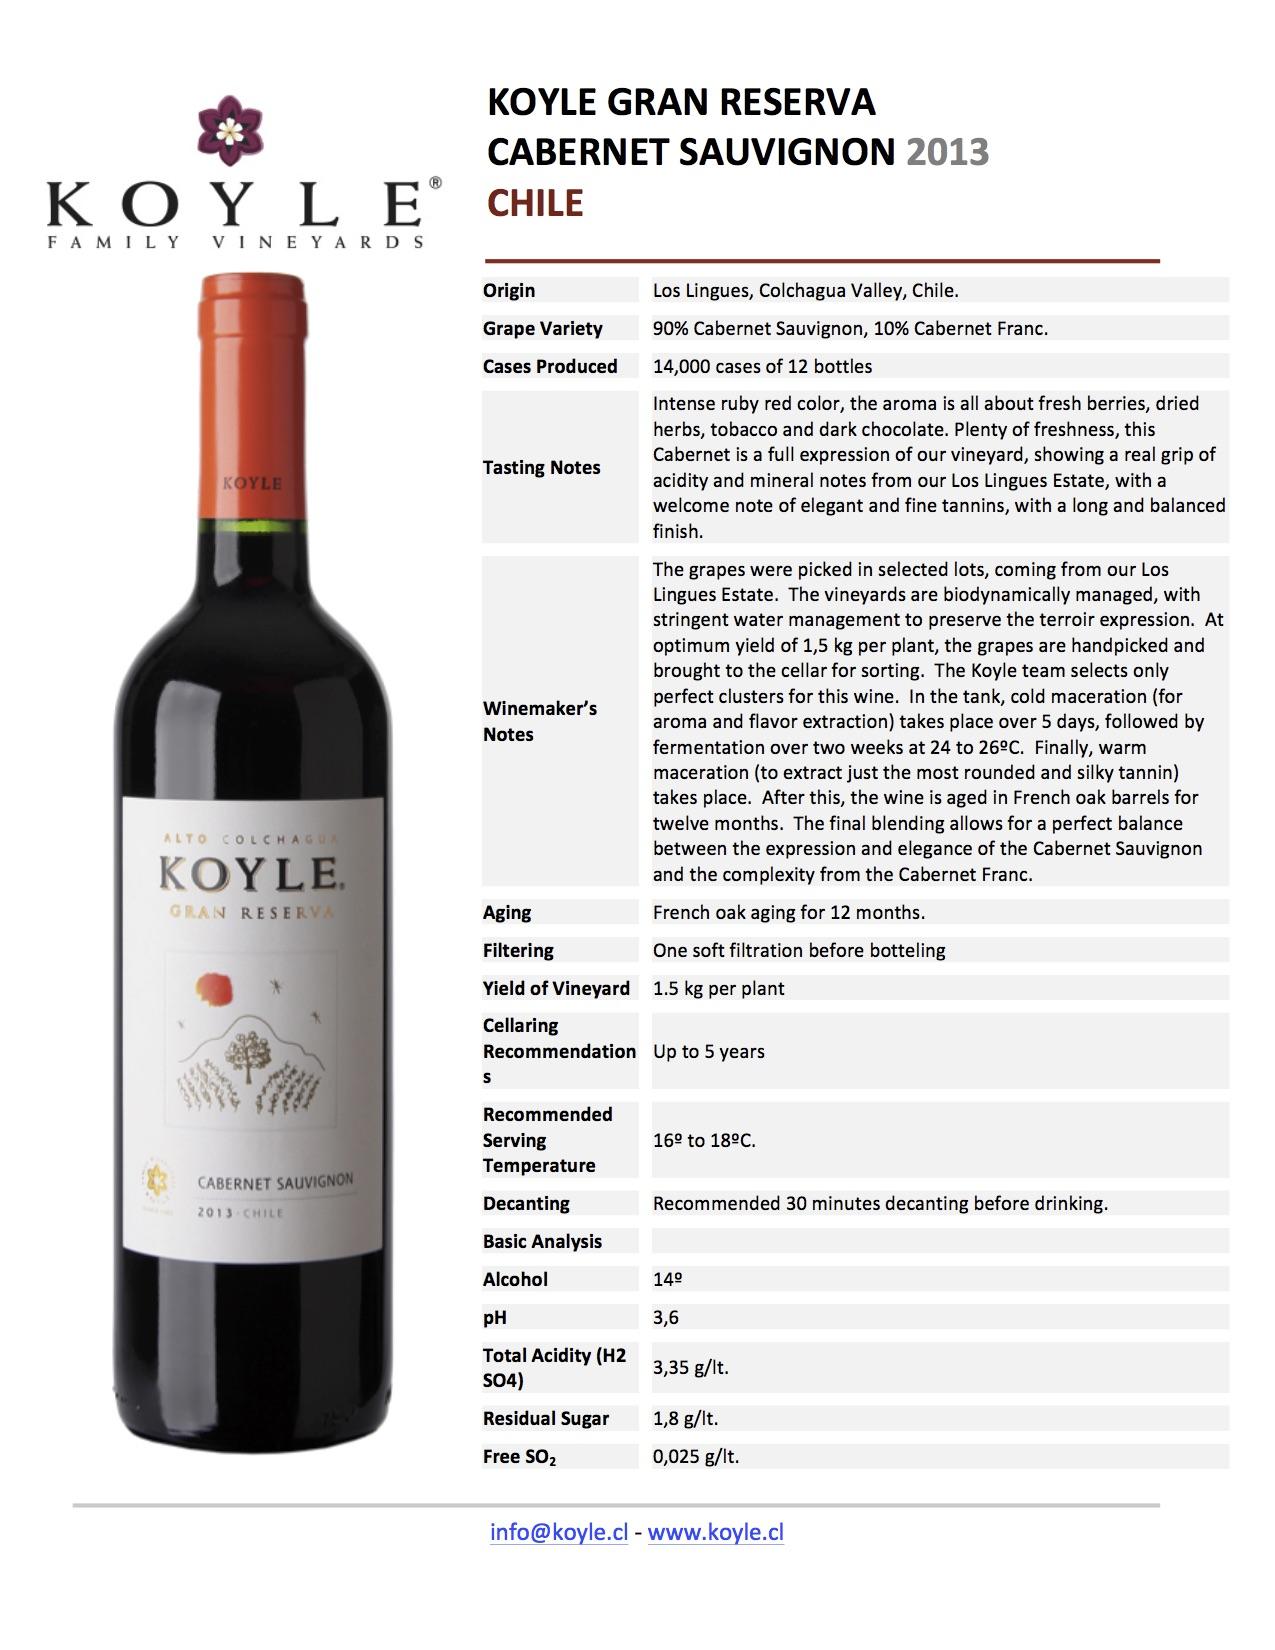 Technical Sheet Koyle Gran Reserva 2013